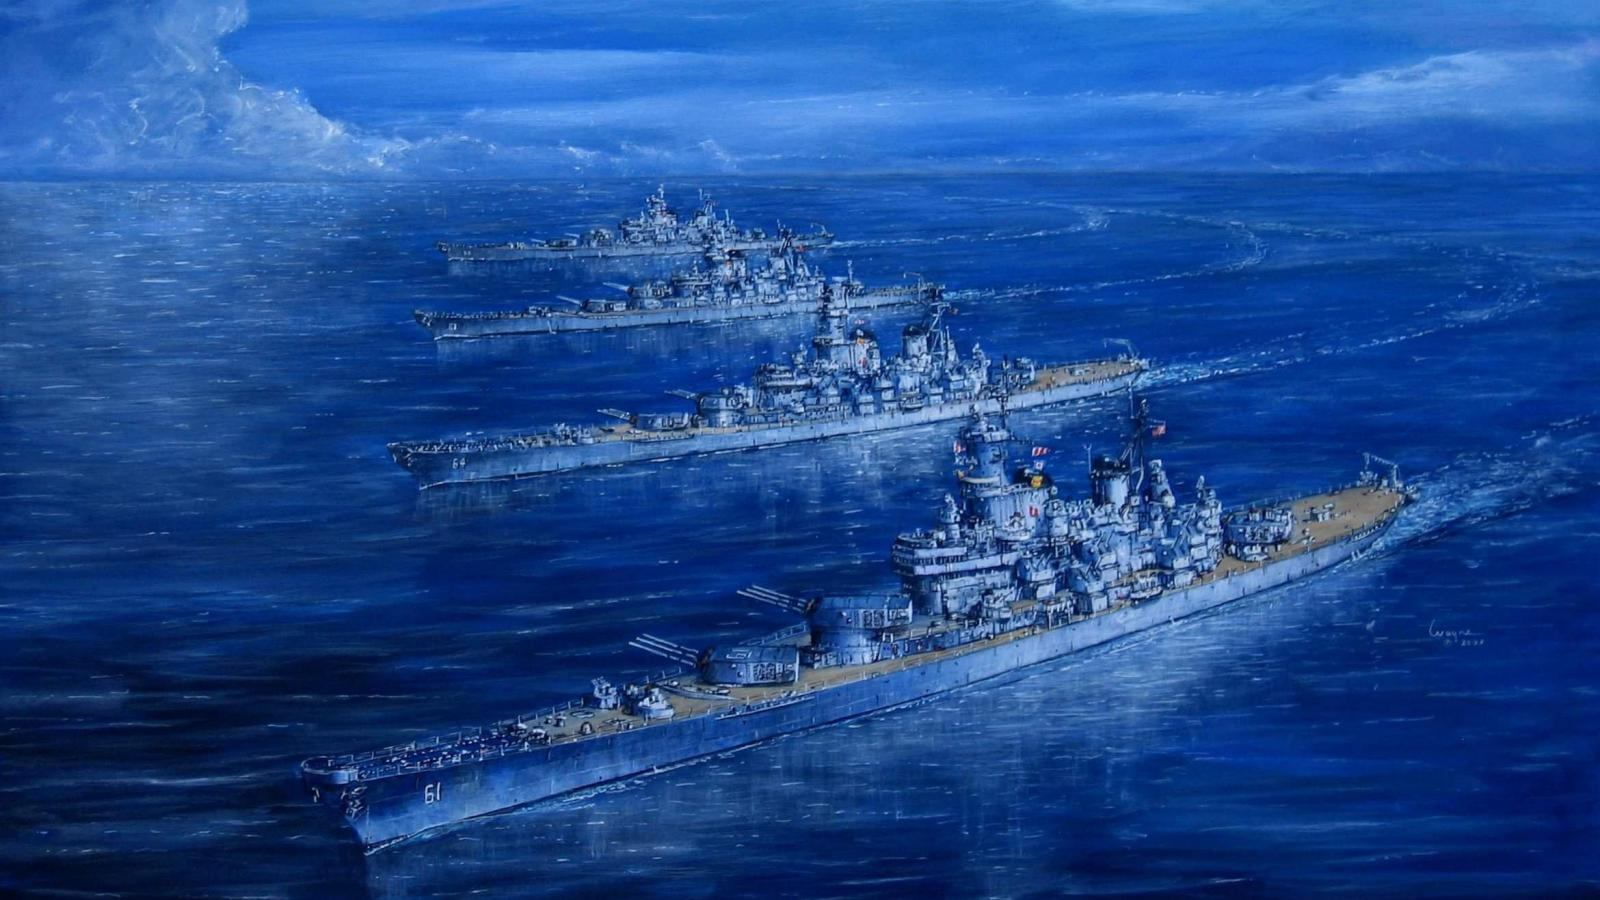 battleship uss missouri wallpaper hq wallpaper 2426 Car Pictures 1600x900